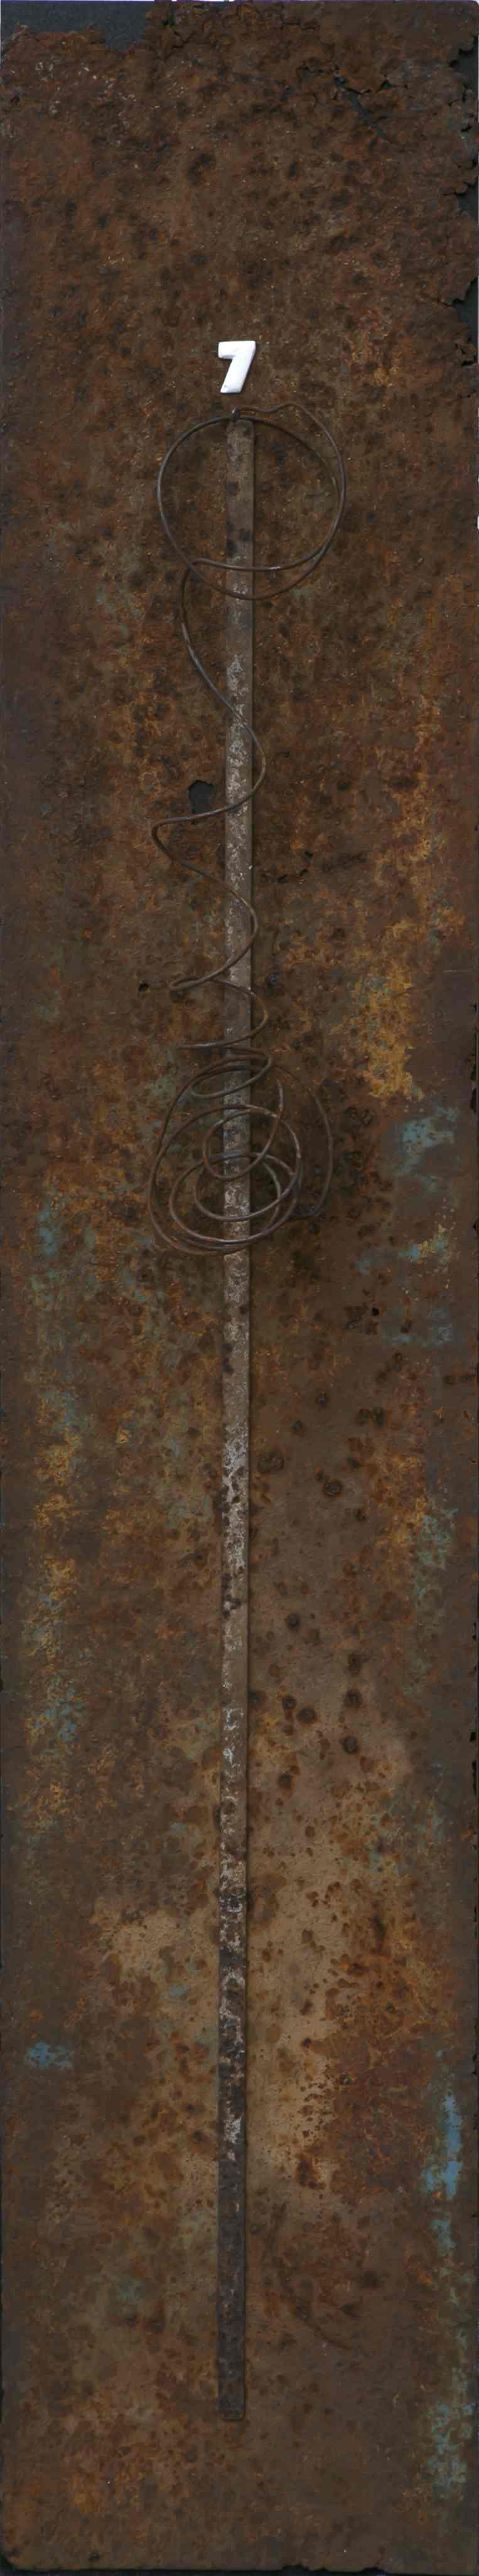 Stele n°5, ferro corroso su tavola, 193x36, 1998